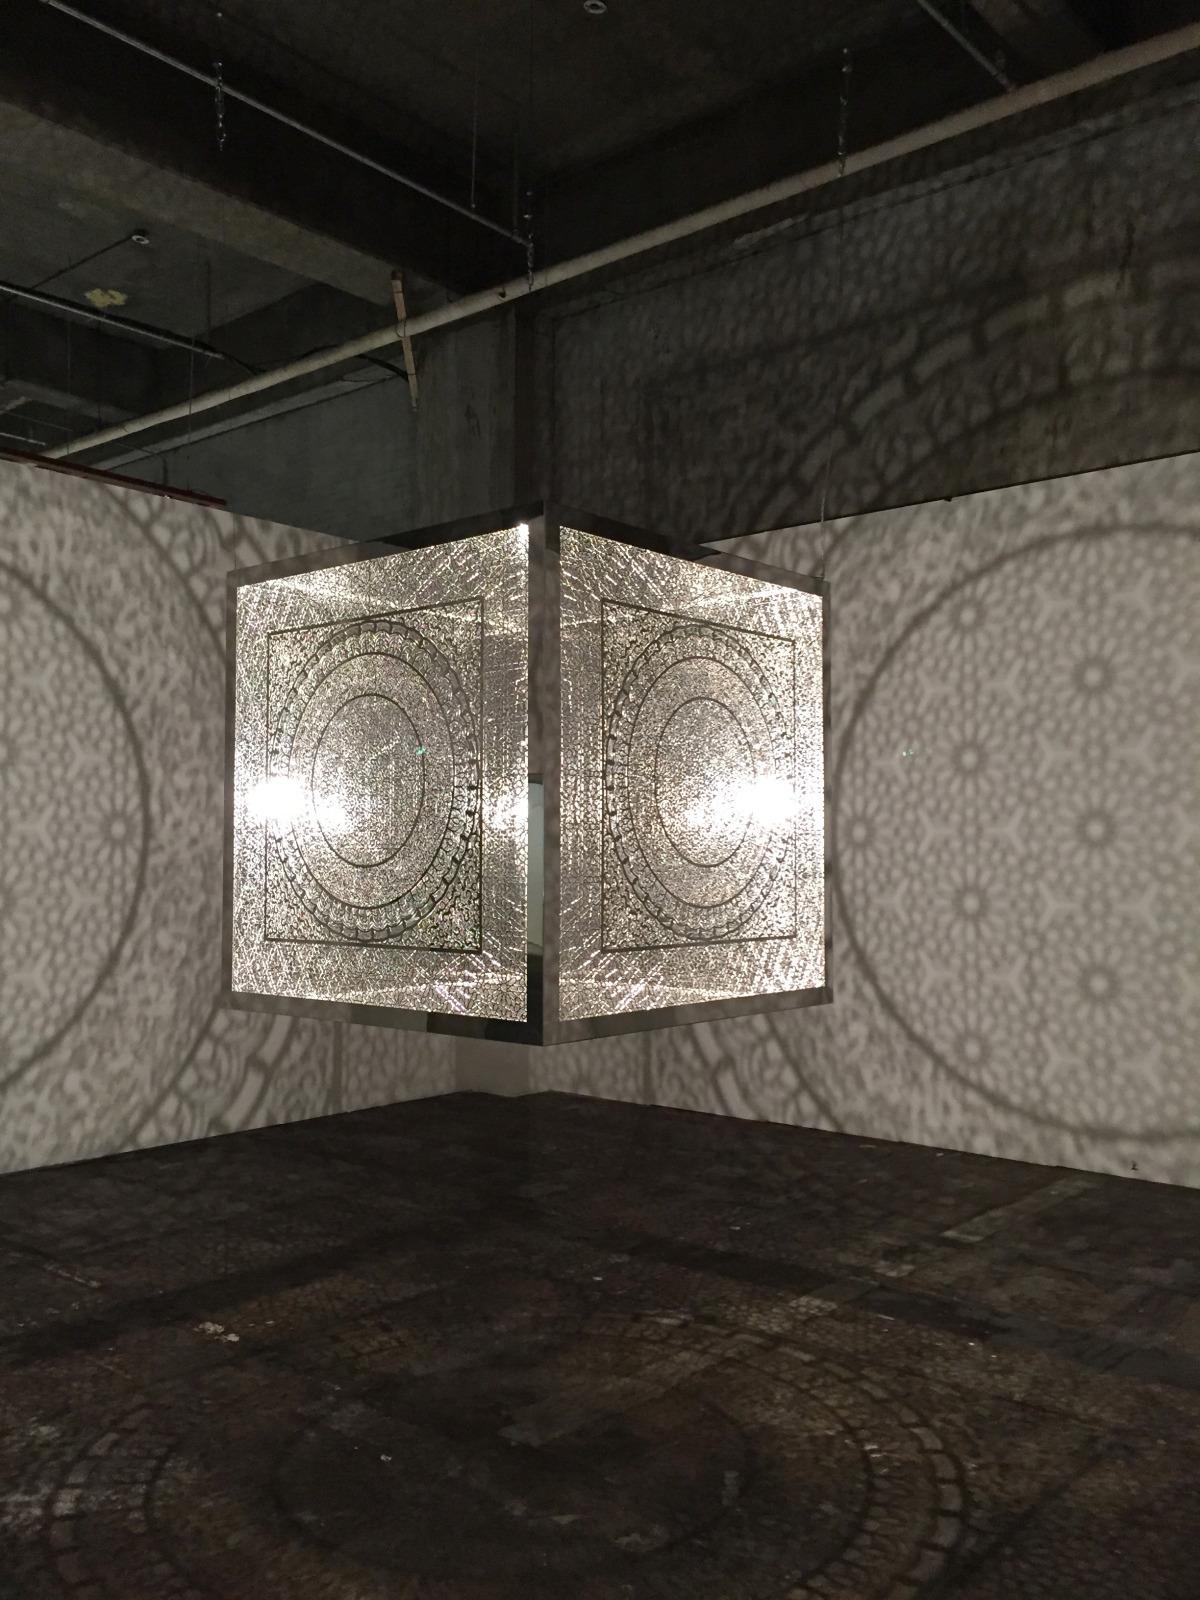 "Crossing Boundaries    Cheongju Craft Biennale: Cheongju, Korea 2015  Polished stainless steel 48"" x 48"" x 48"" 2014-15"